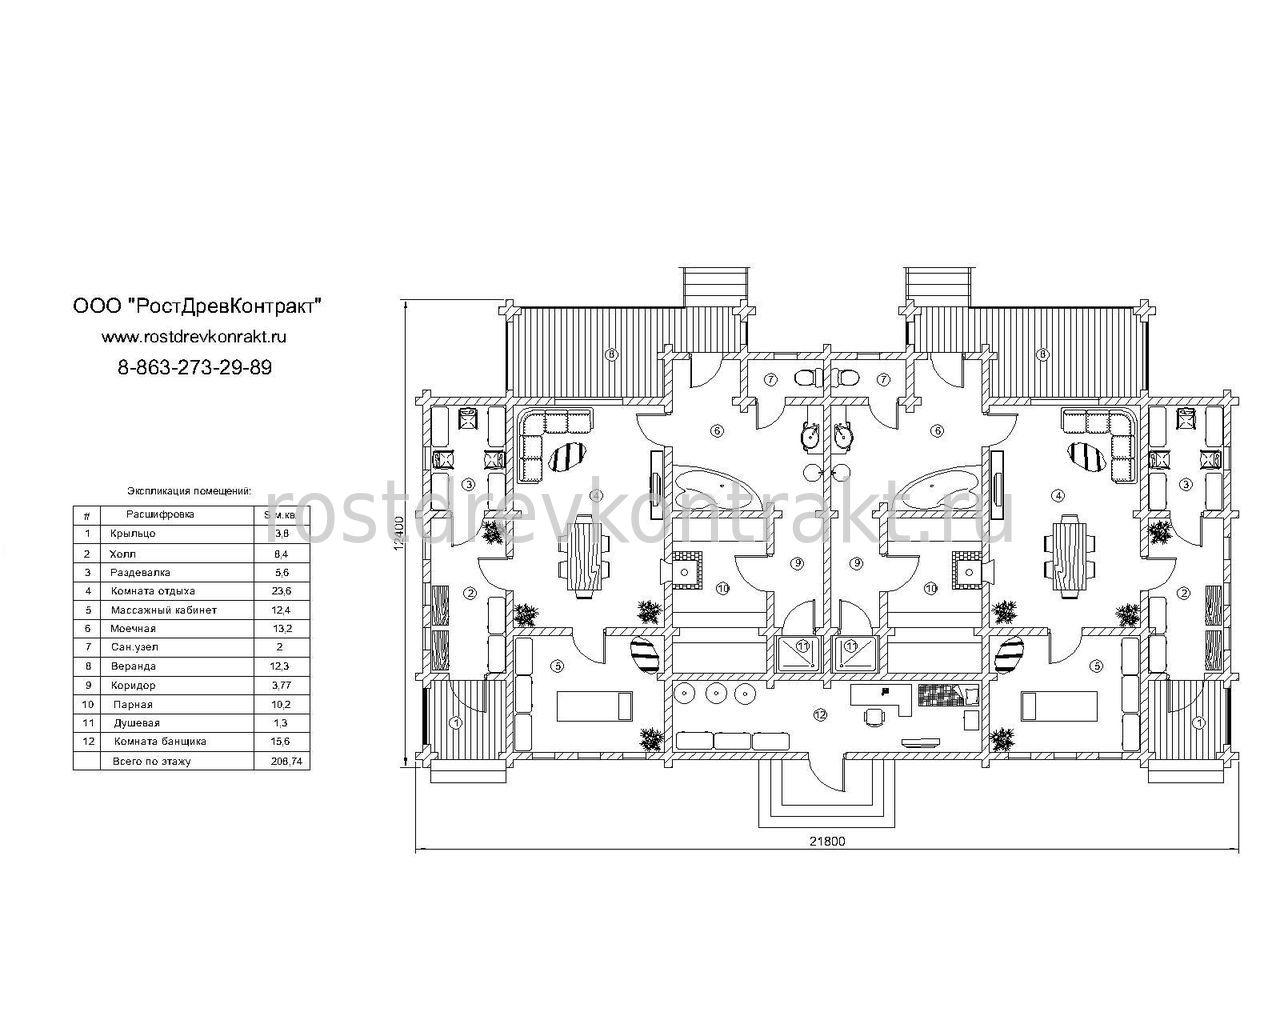 Бизнес-план строительства бани